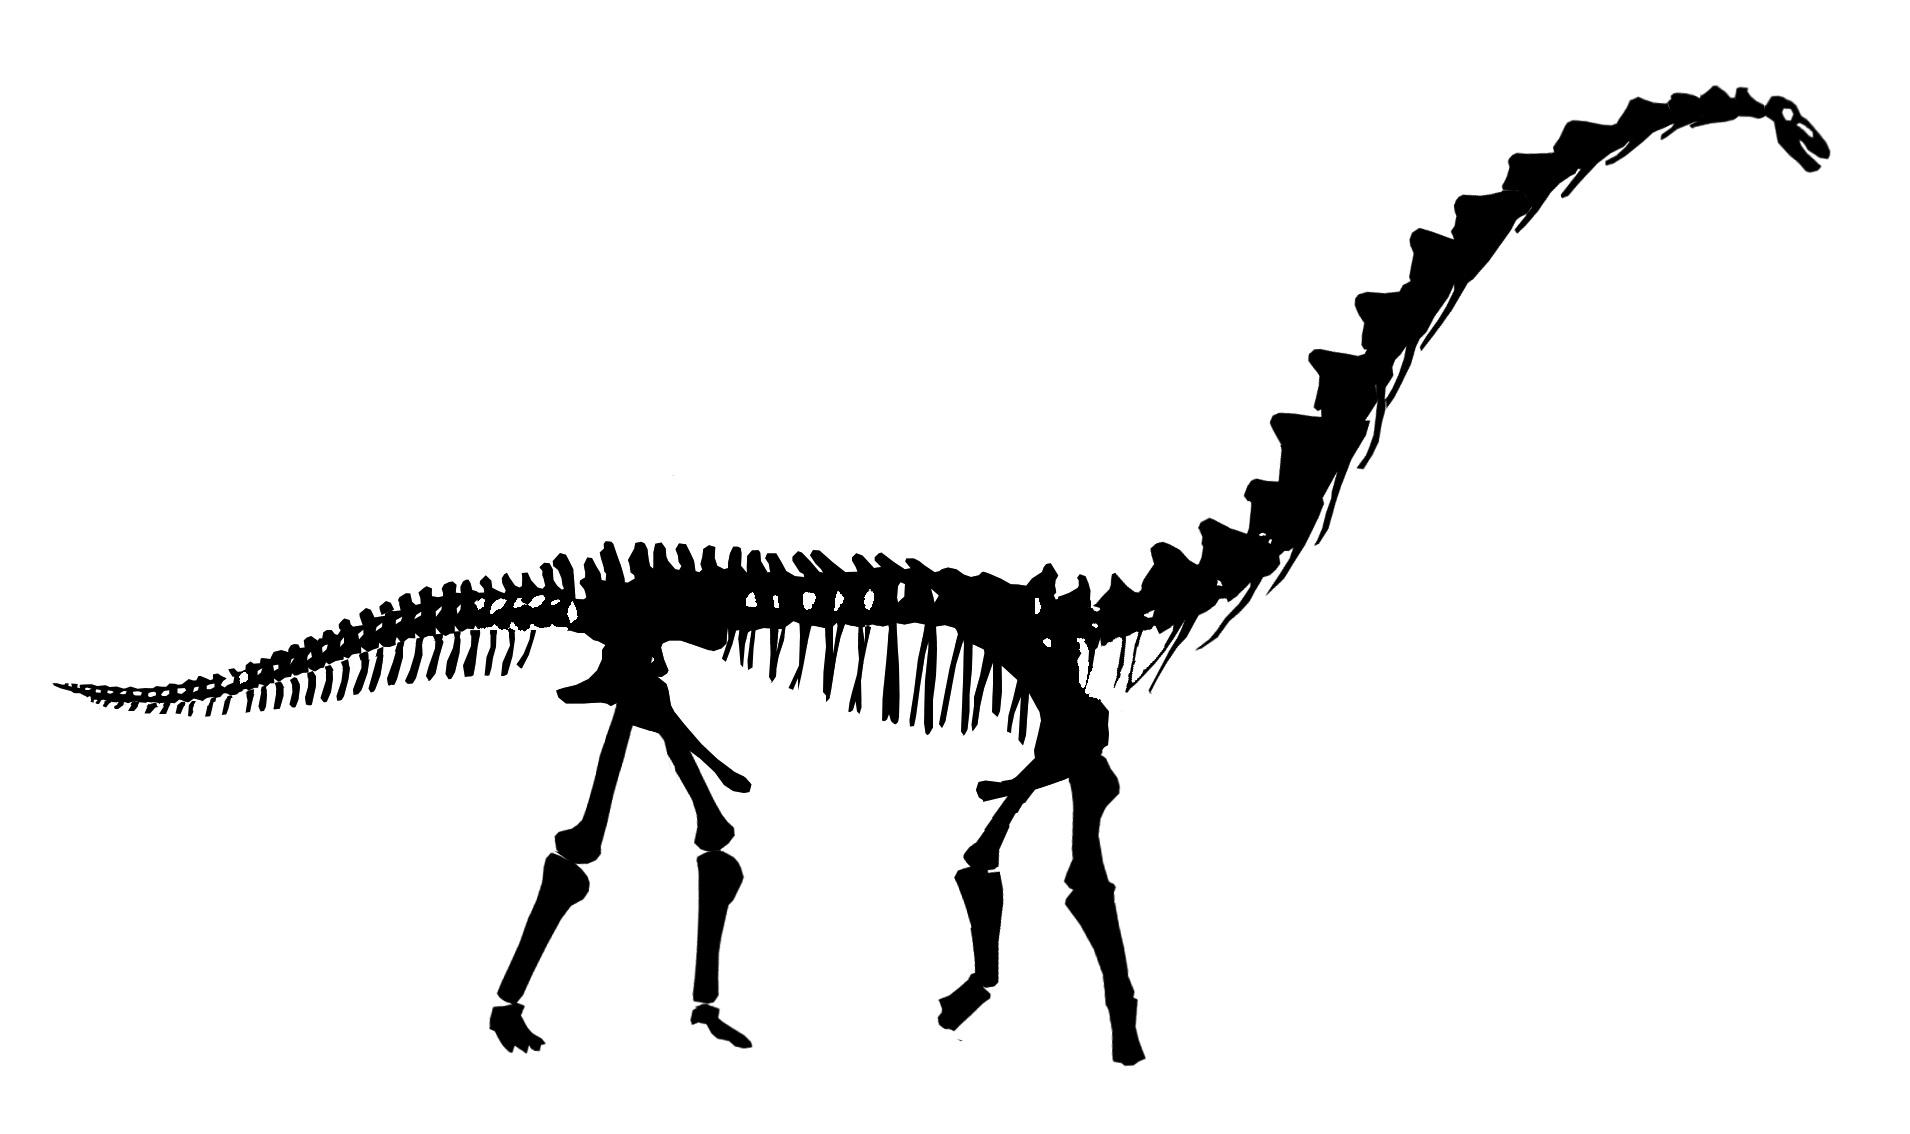 Stegosaurus skeleton silhouette clipart clip black and white Free Dinosaur Bones Clipart, Download Free Clip Art, Free ... clip black and white